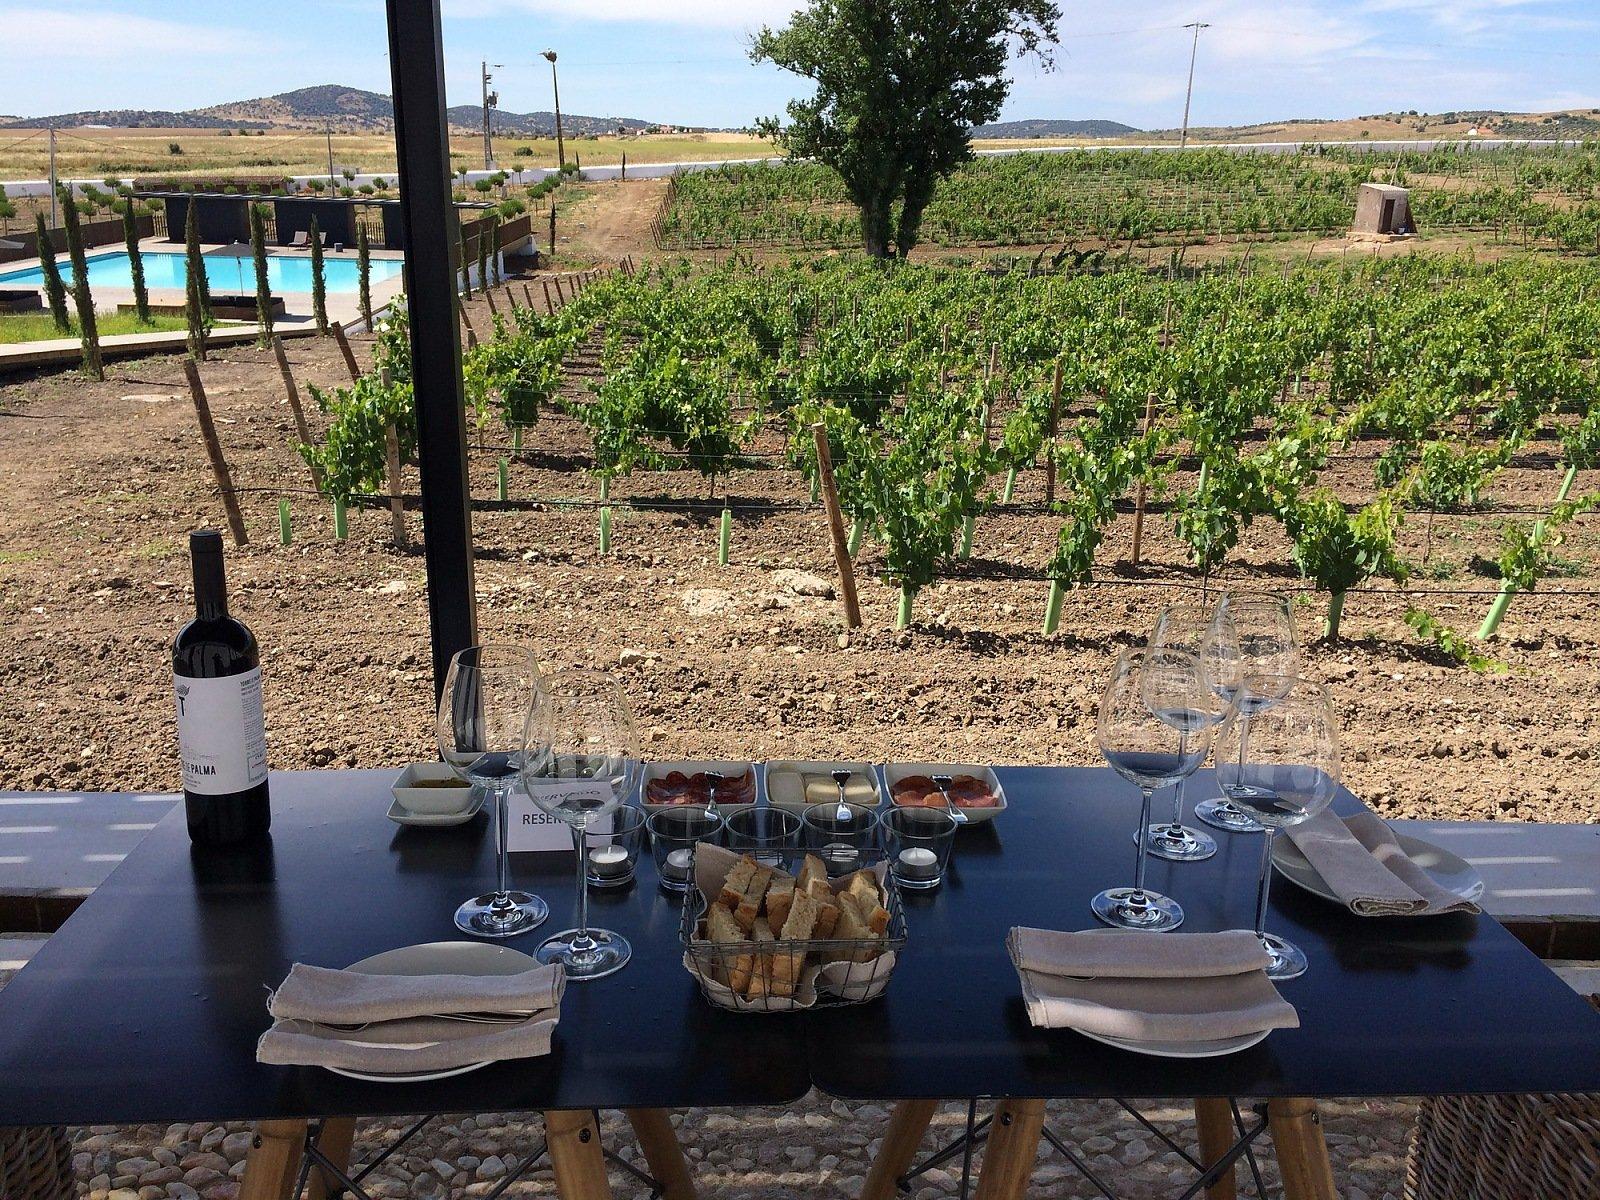 Hotel Torre de Palma Wine - Monforte